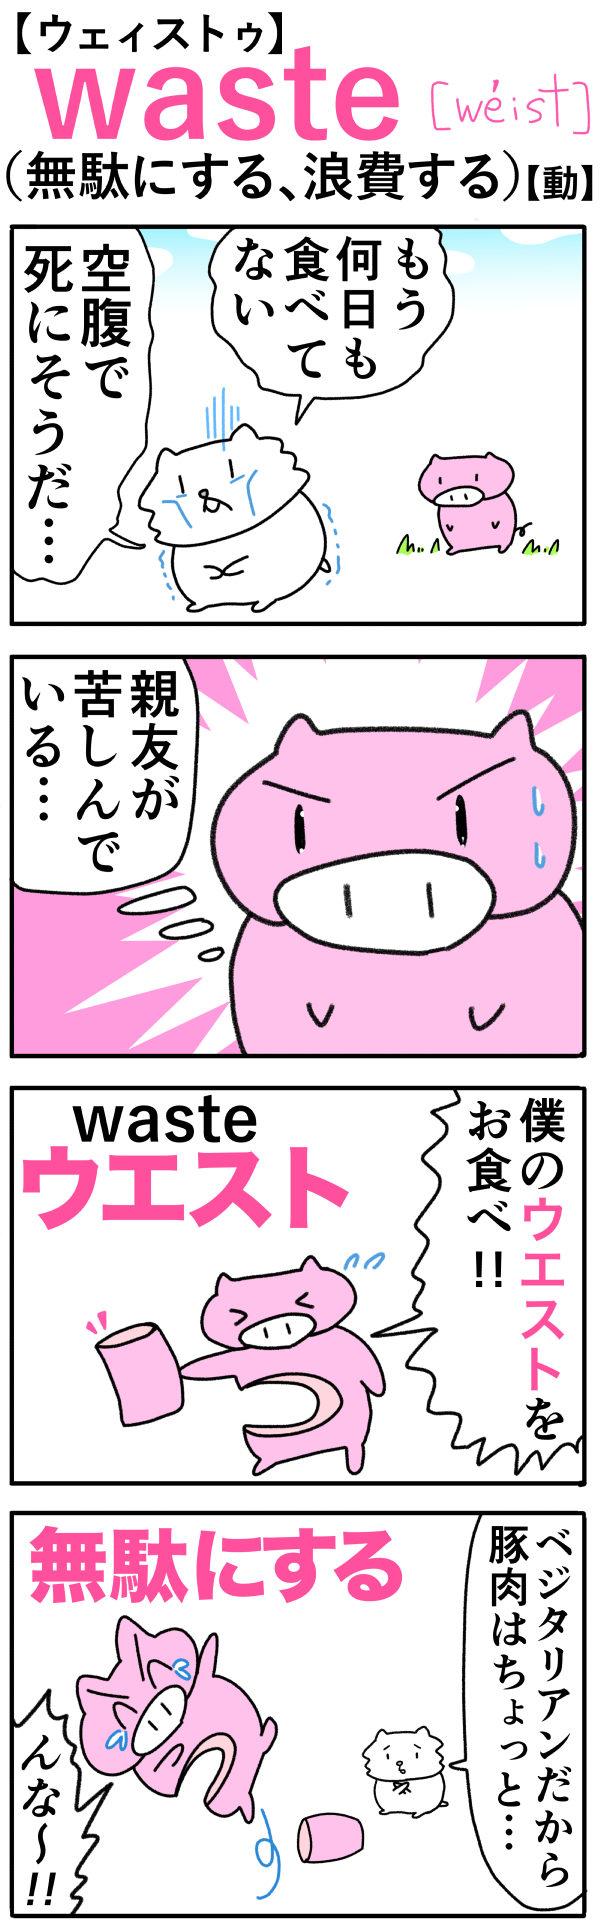 waste(無駄にする)の語呂合わせ英単語